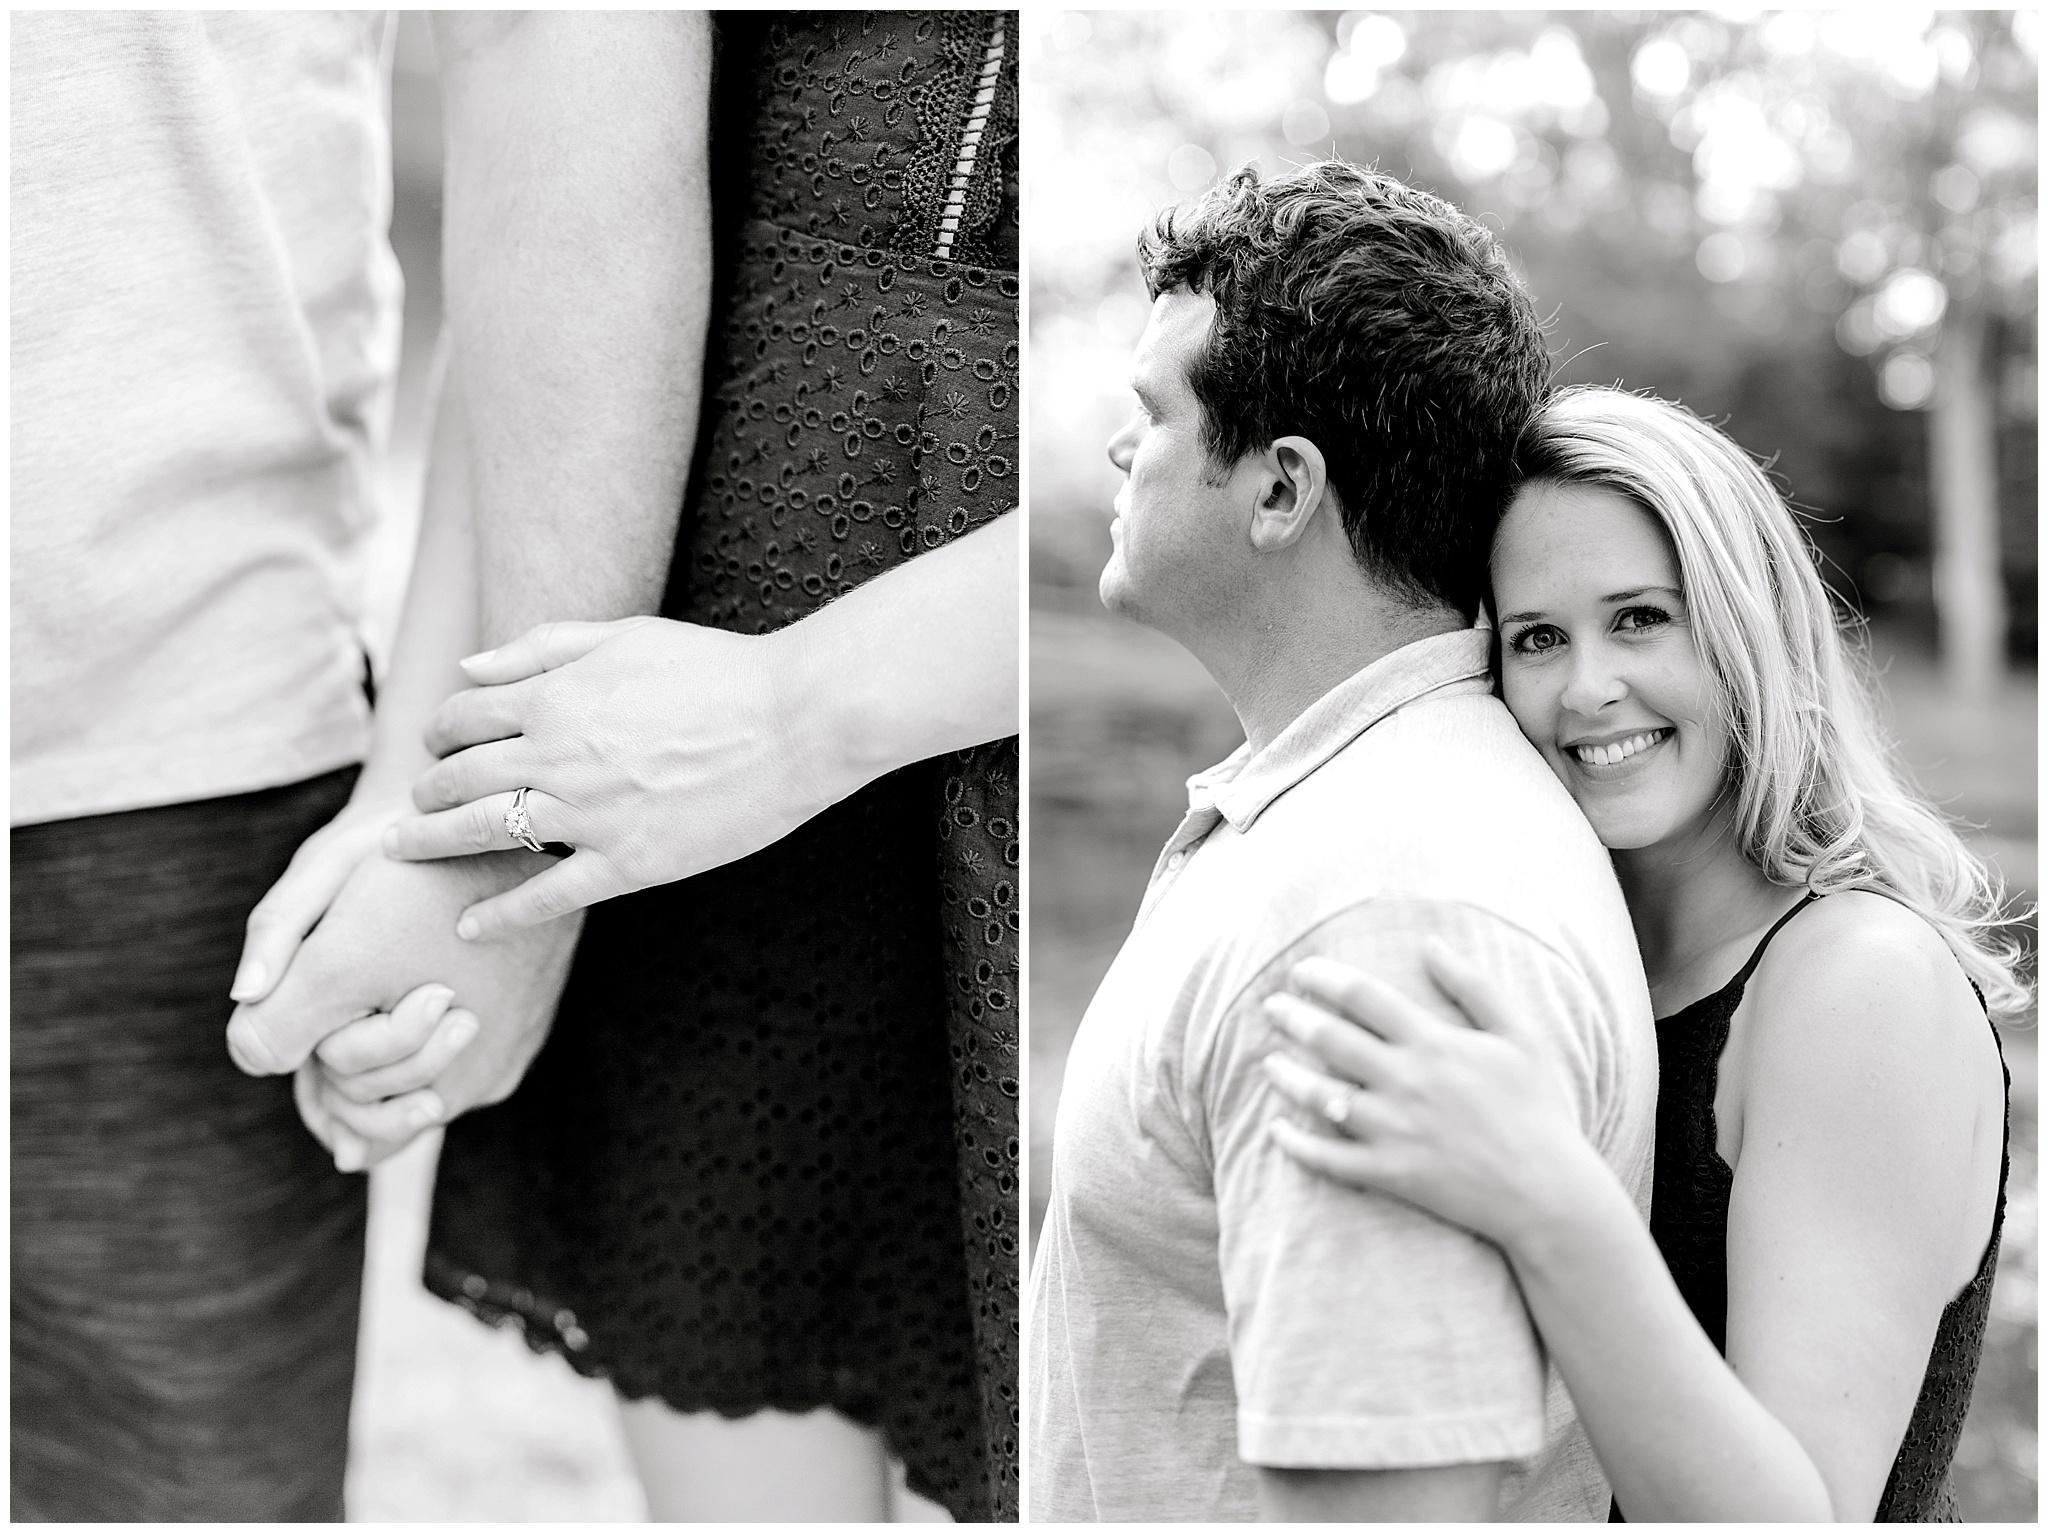 Arlington Engagement Photographer, Arlington Engagement Session, Arlington VA Wedding Photographer, Arlington VA Engagement Photographer